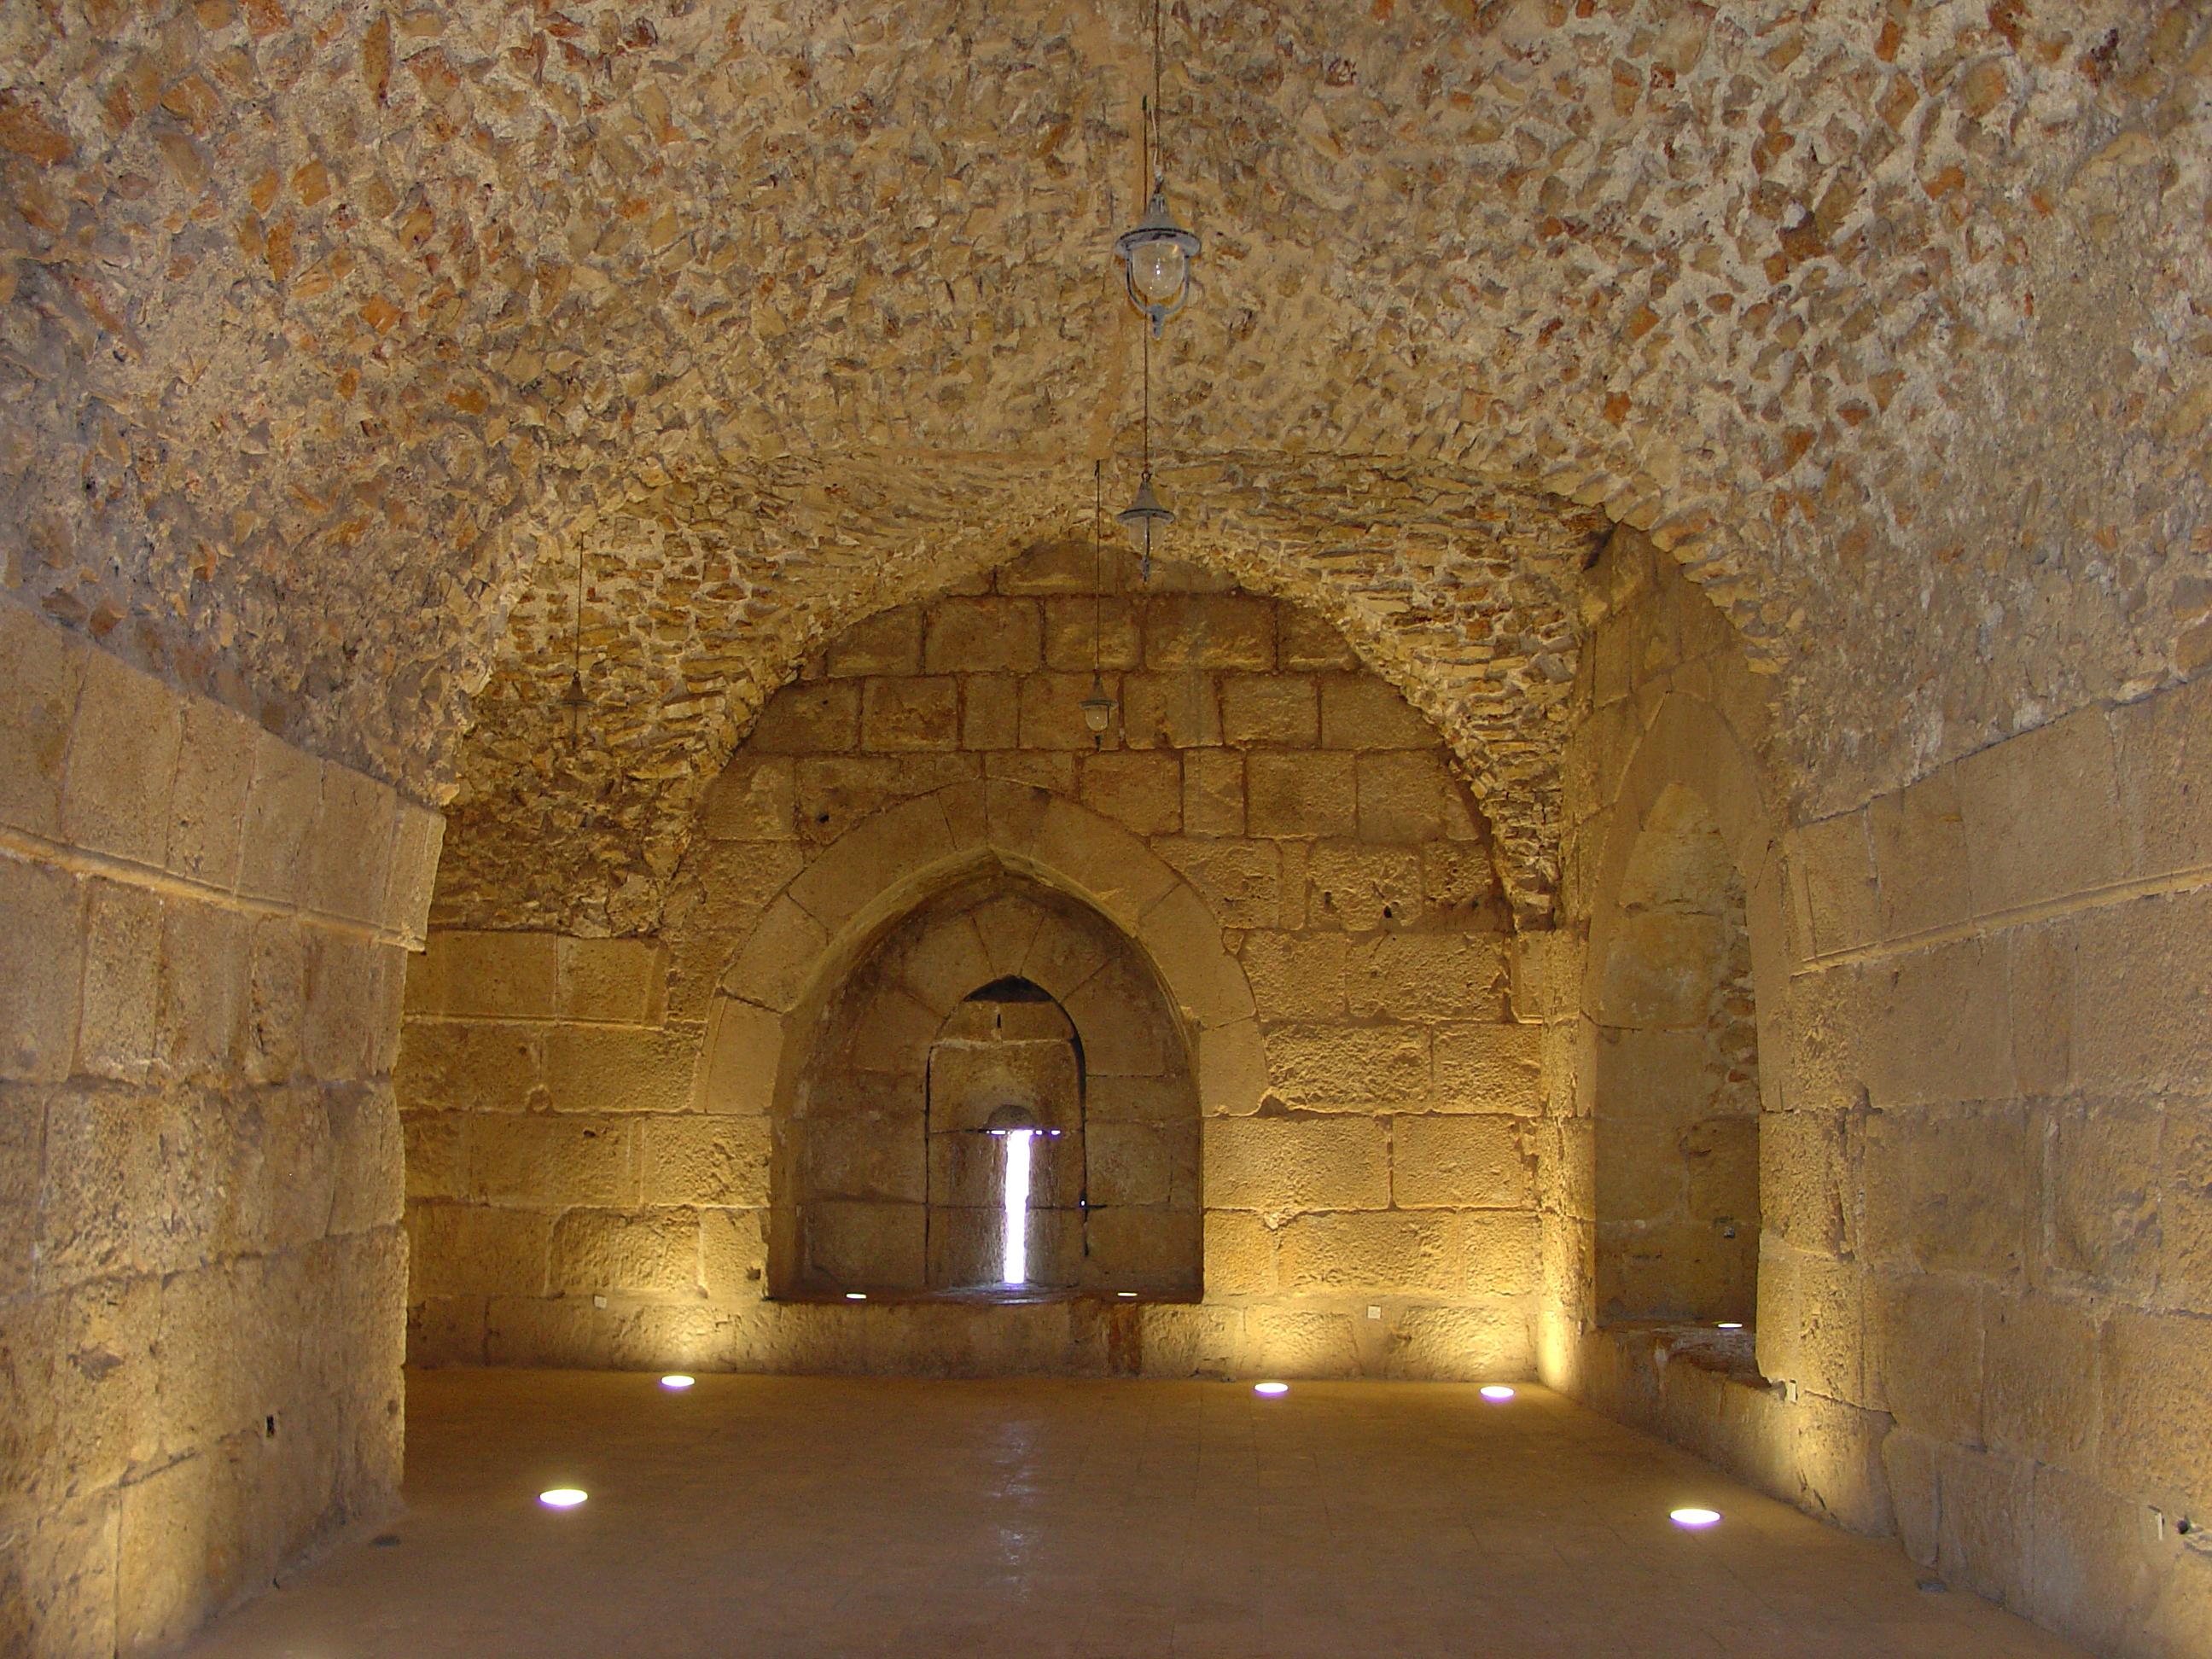 FileUpper Room Ajlun Castle Jordan0909jpg  Wikimedia